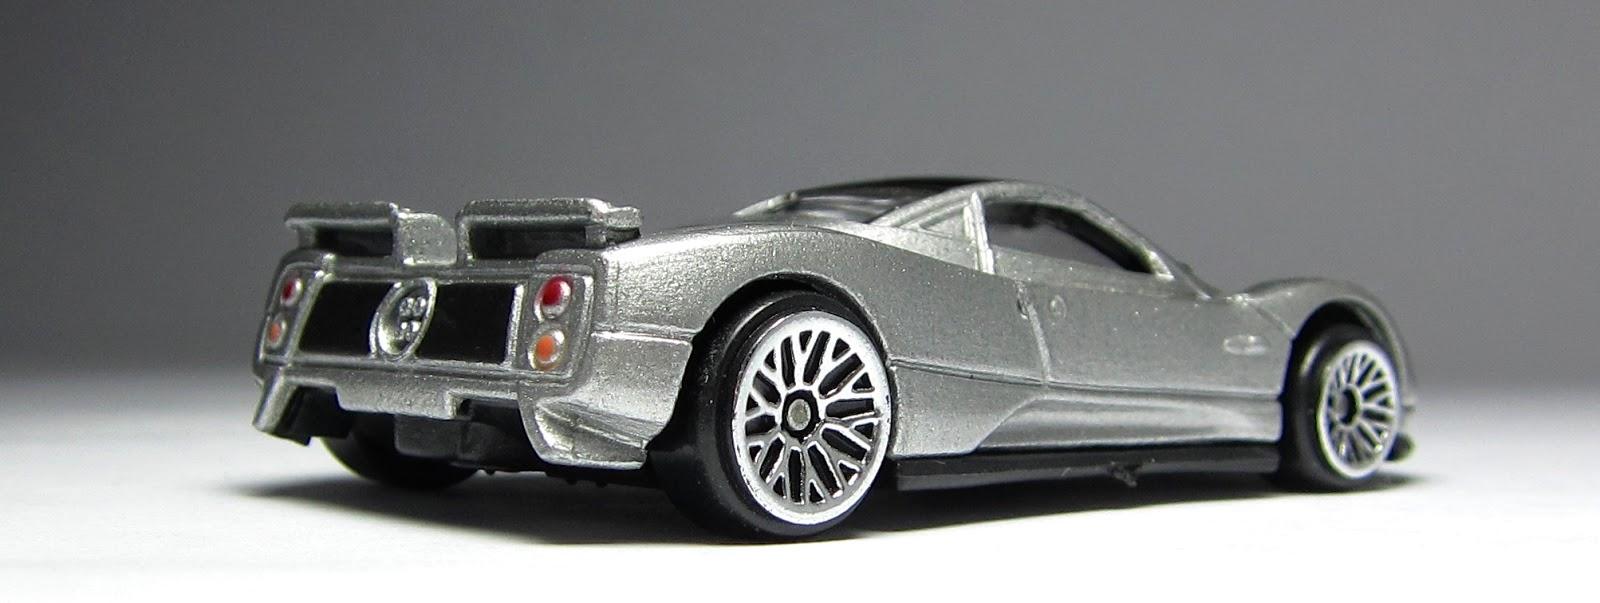 New Cars Amp Car Reviews Concept Cars Amp Auto Shows